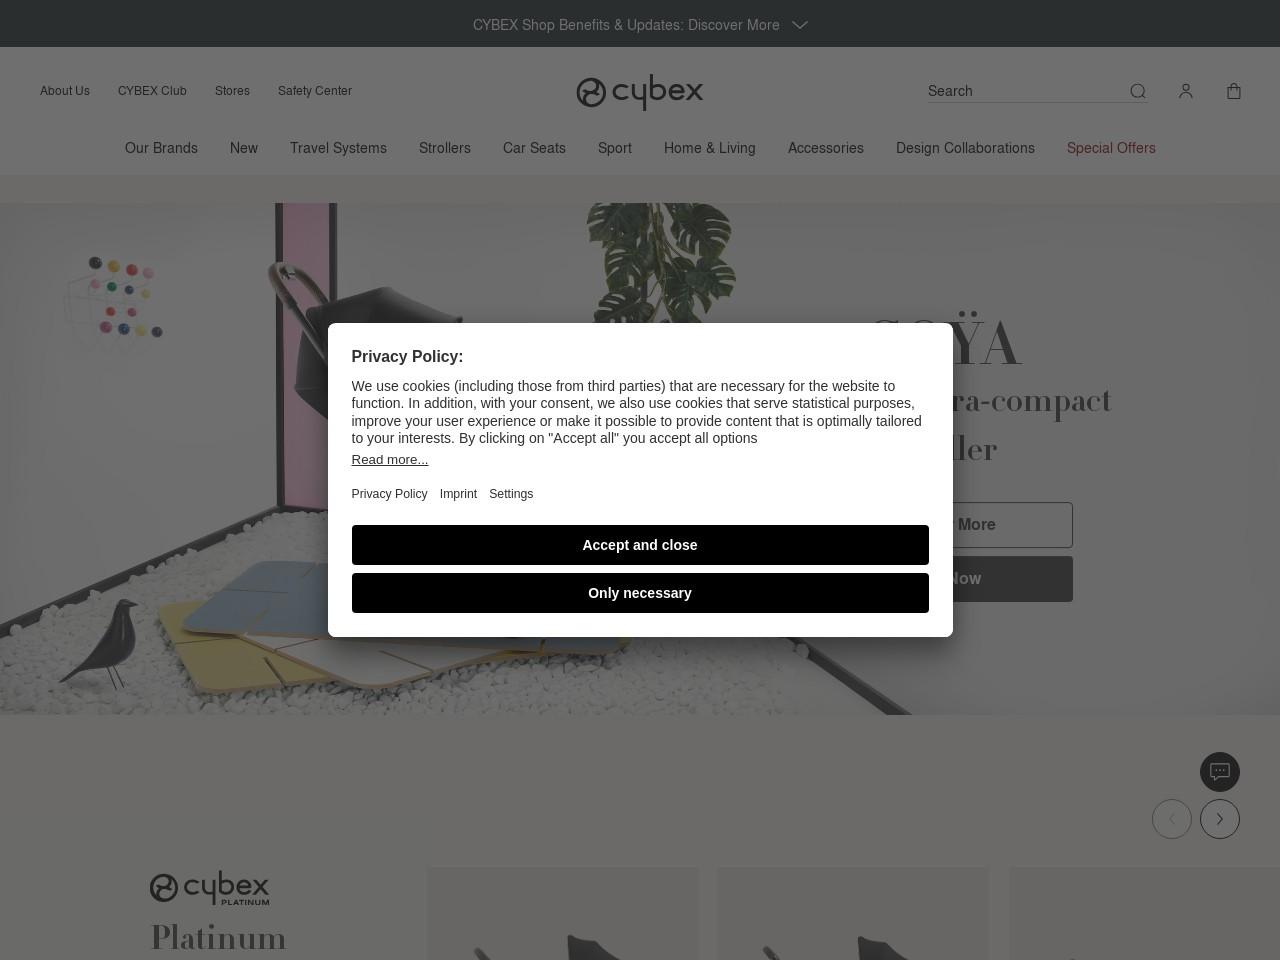 cybex-online.com